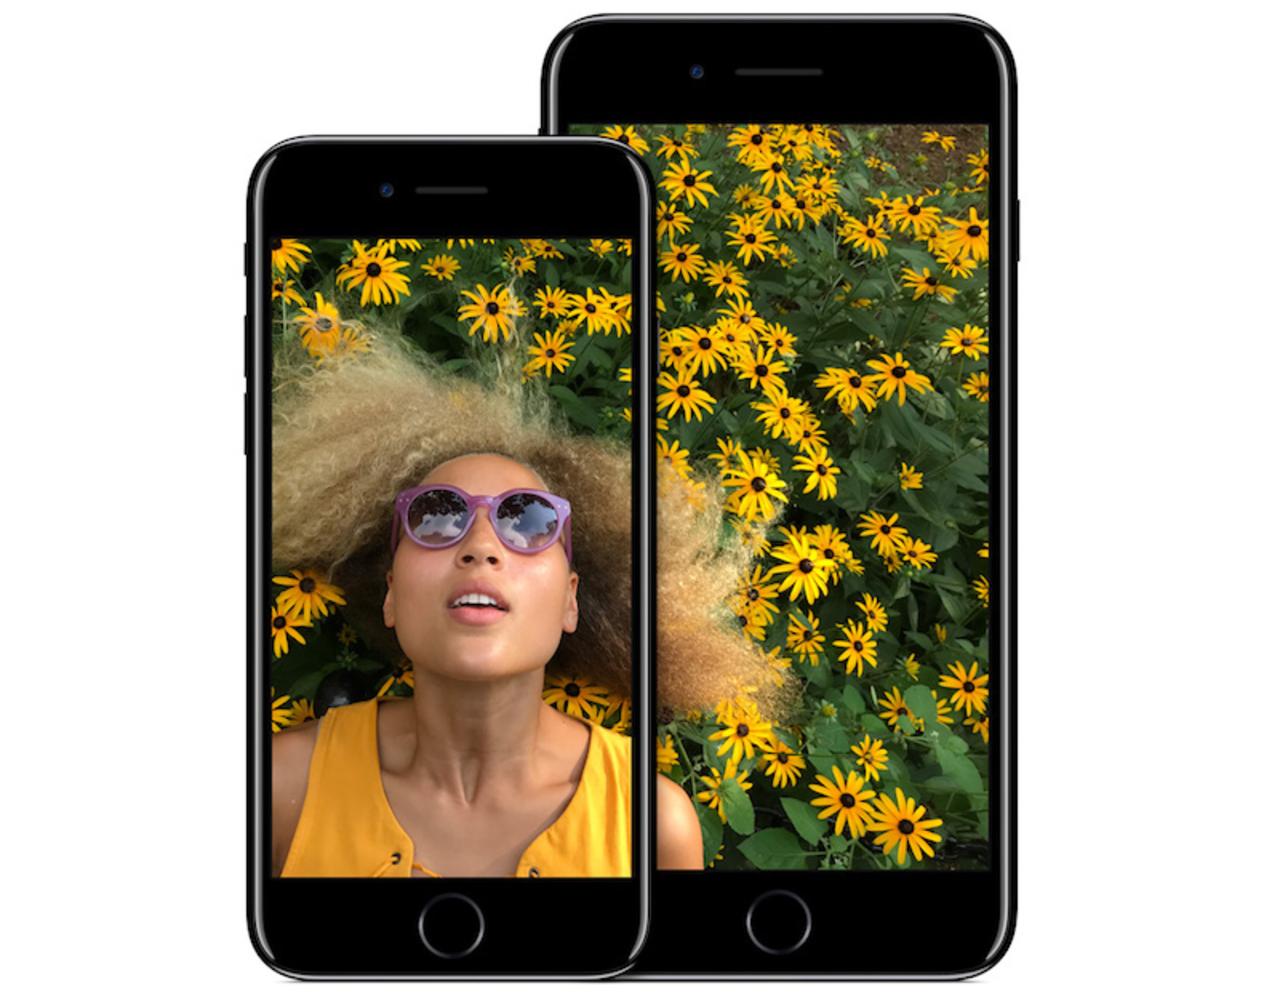 Ganti Layar iPhone Non Resmi, Garansi Tidak Hangus